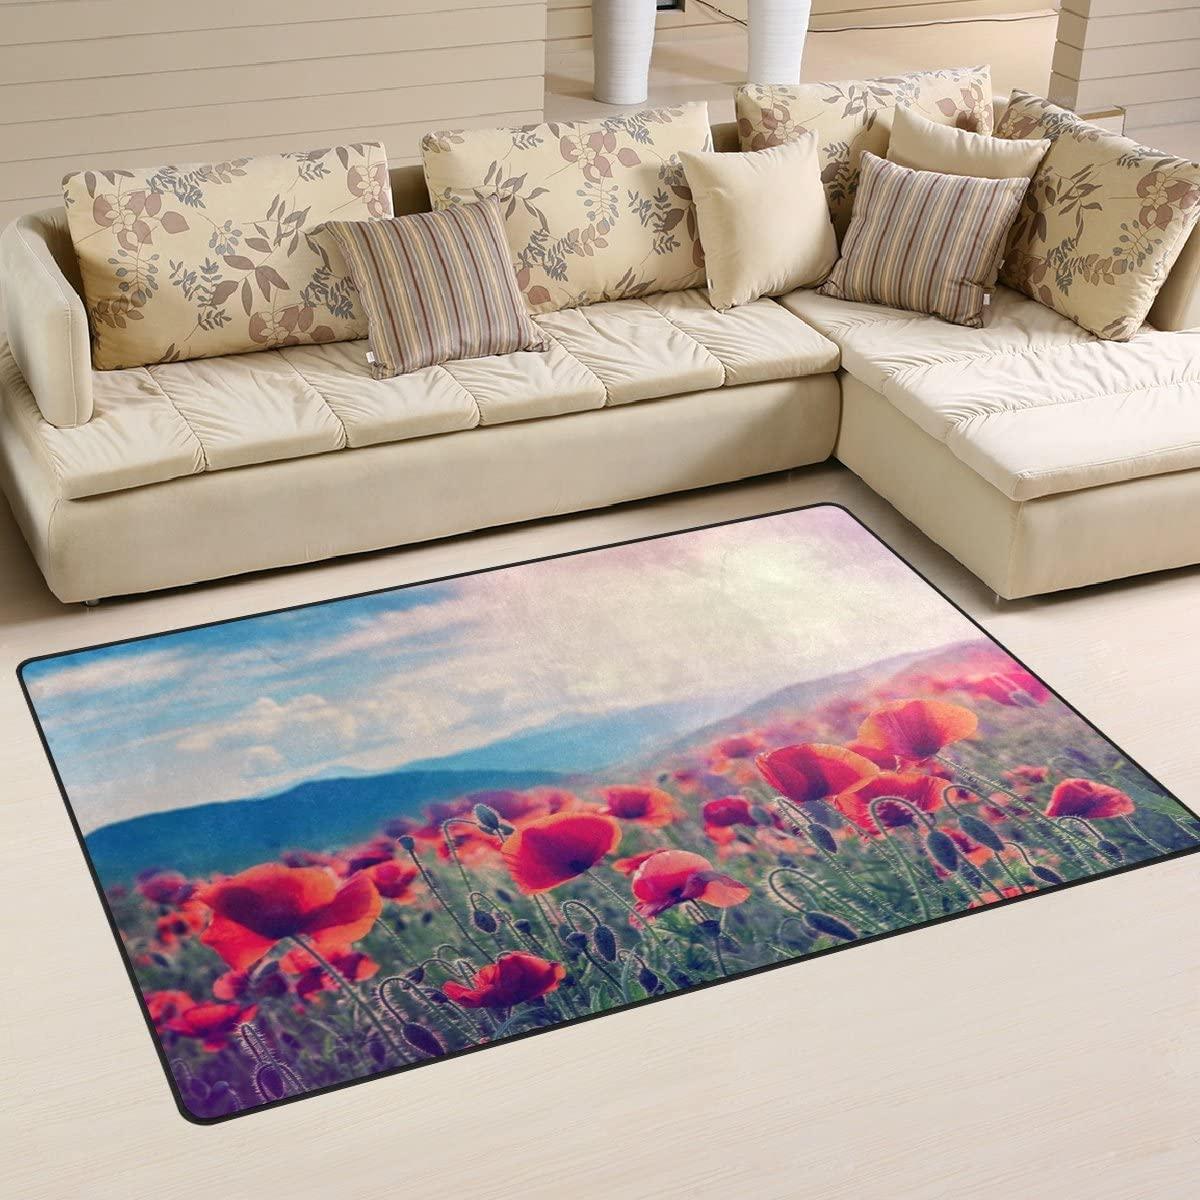 WellLee Area Rug,Sunset Mountain Meadow Poppy Flowers Floor Rug Non-Slip Doormat for Living Dining Dorm Room Bedroom Decor 31x20 Inch